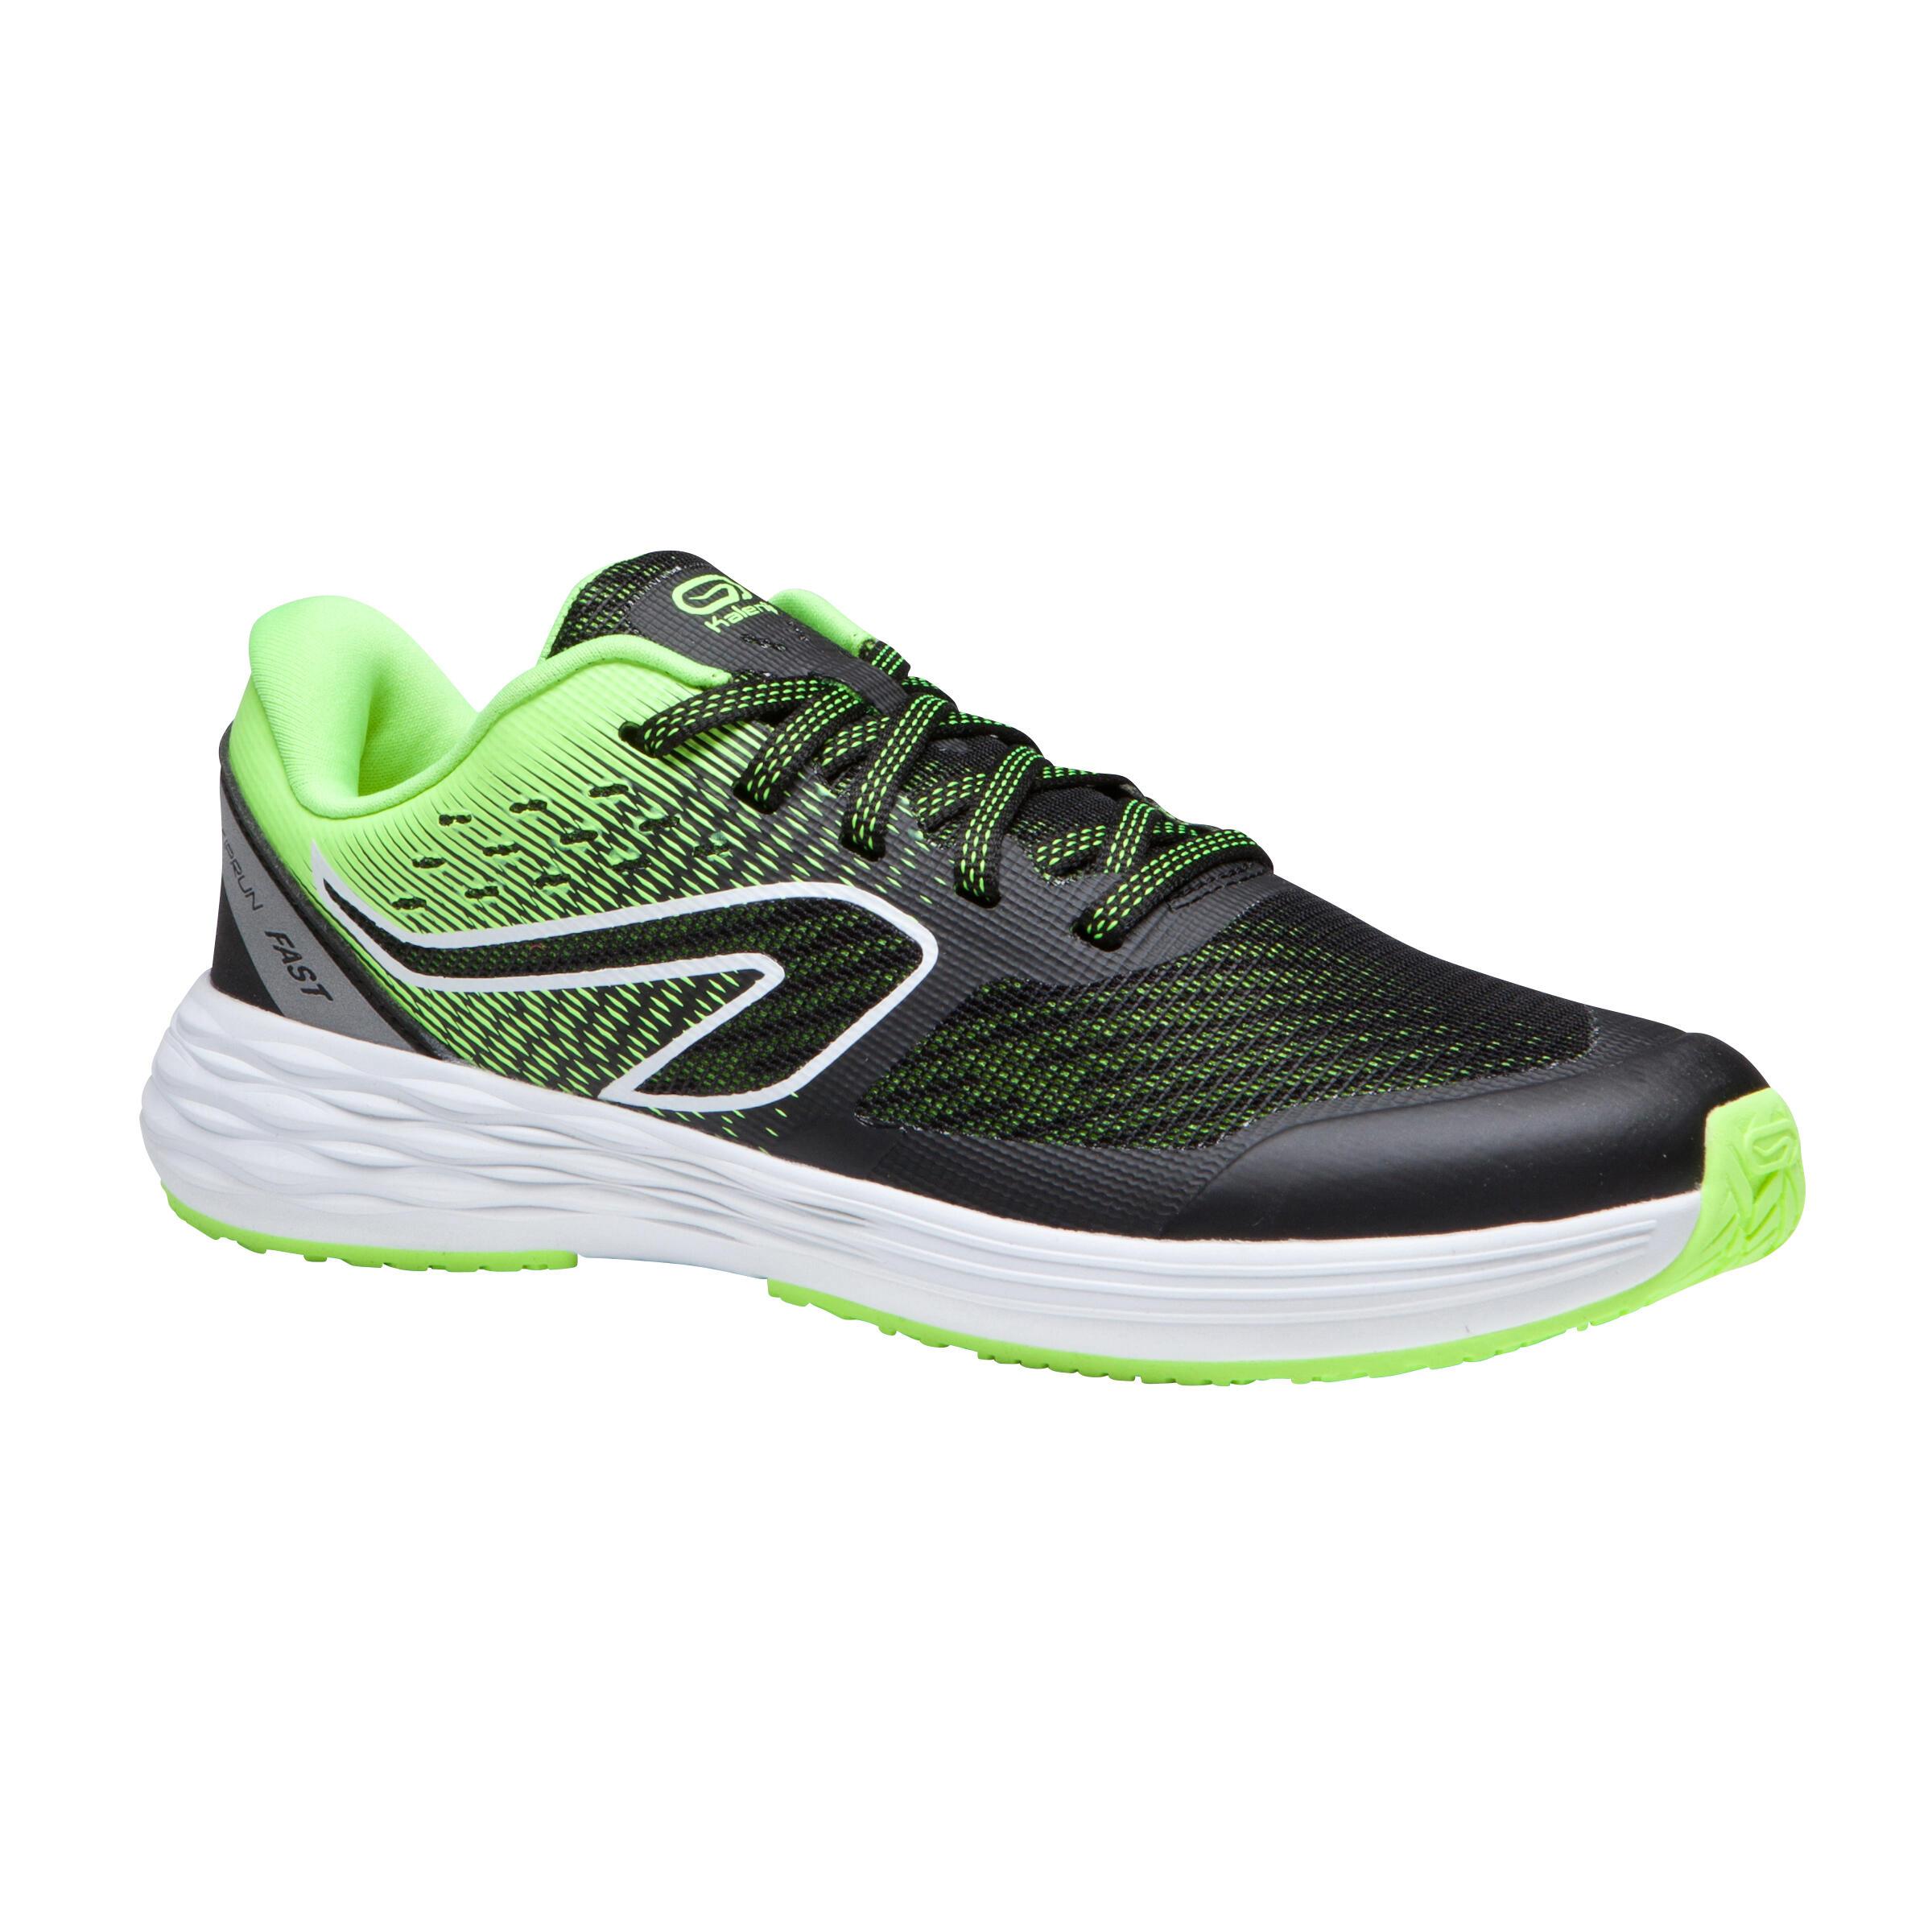 Kiprun Children's Athletics Shoes - Black Yellow Fluo